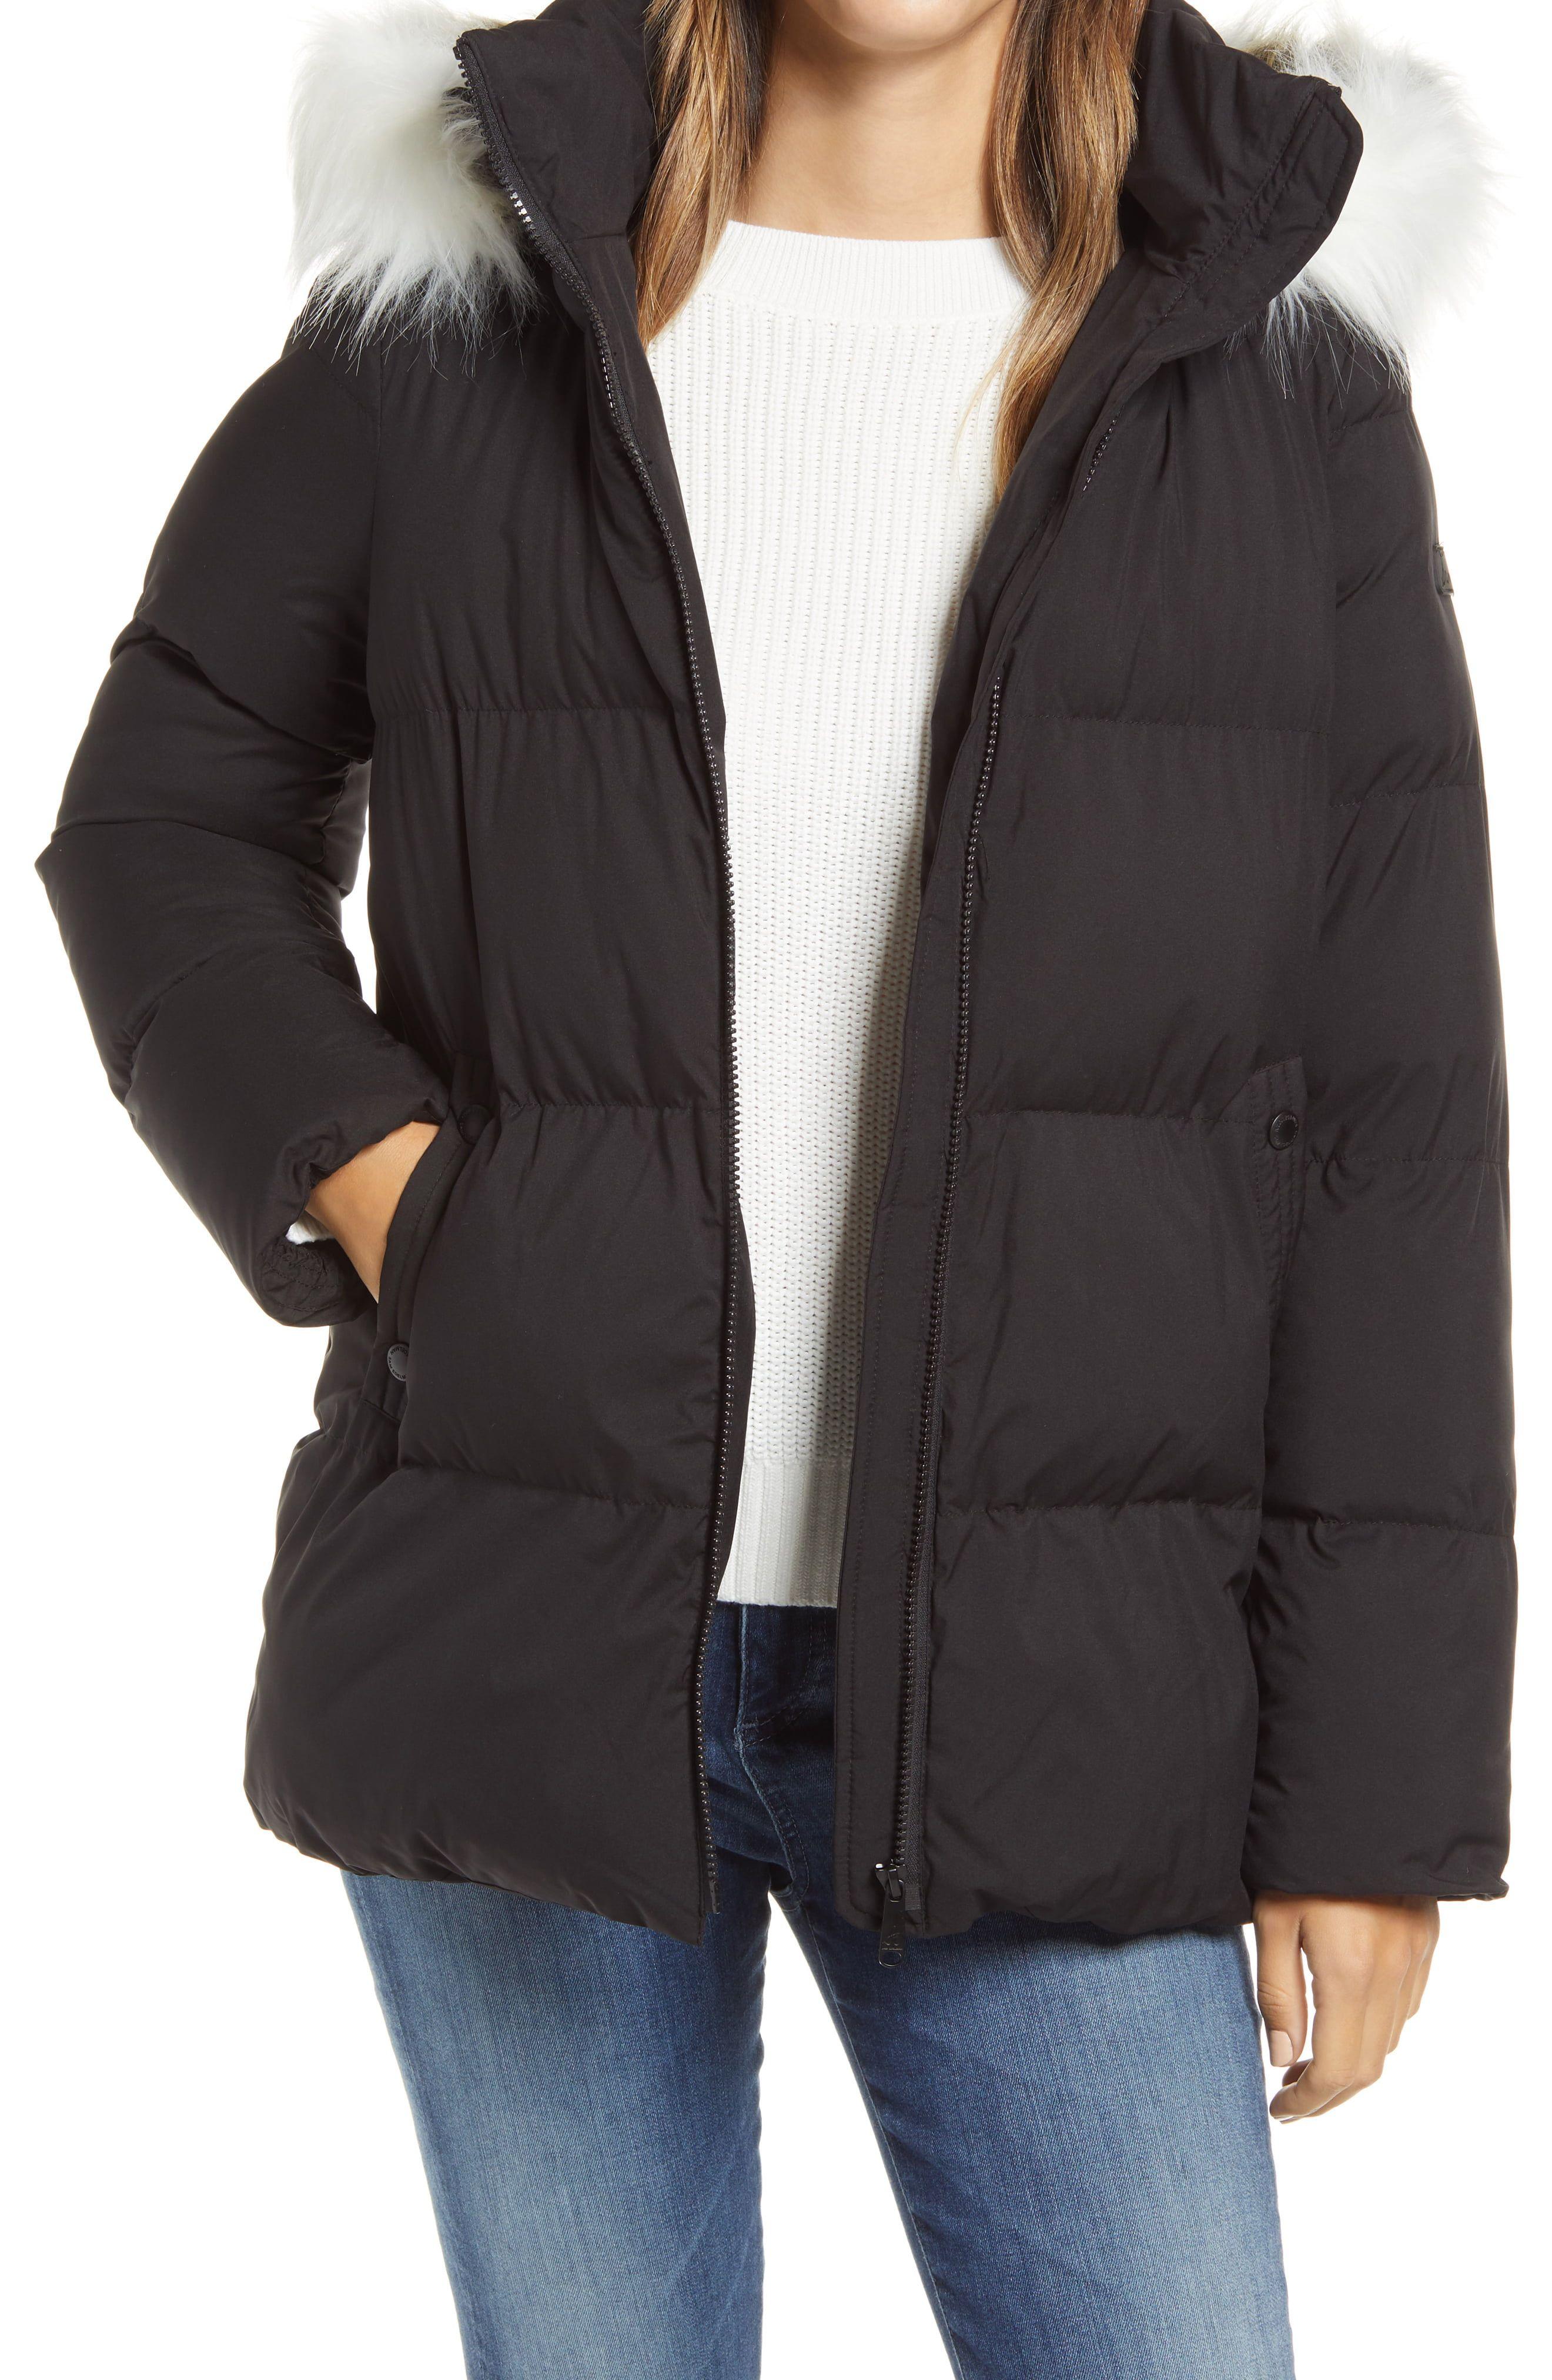 Sam Edelman Water Repellent Faux Fur Trim Puffer Jacket Nordstrom Winter Coat Warmest Fur Hood Jacket Black Puffer Jacket [ 4048 x 2640 Pixel ]